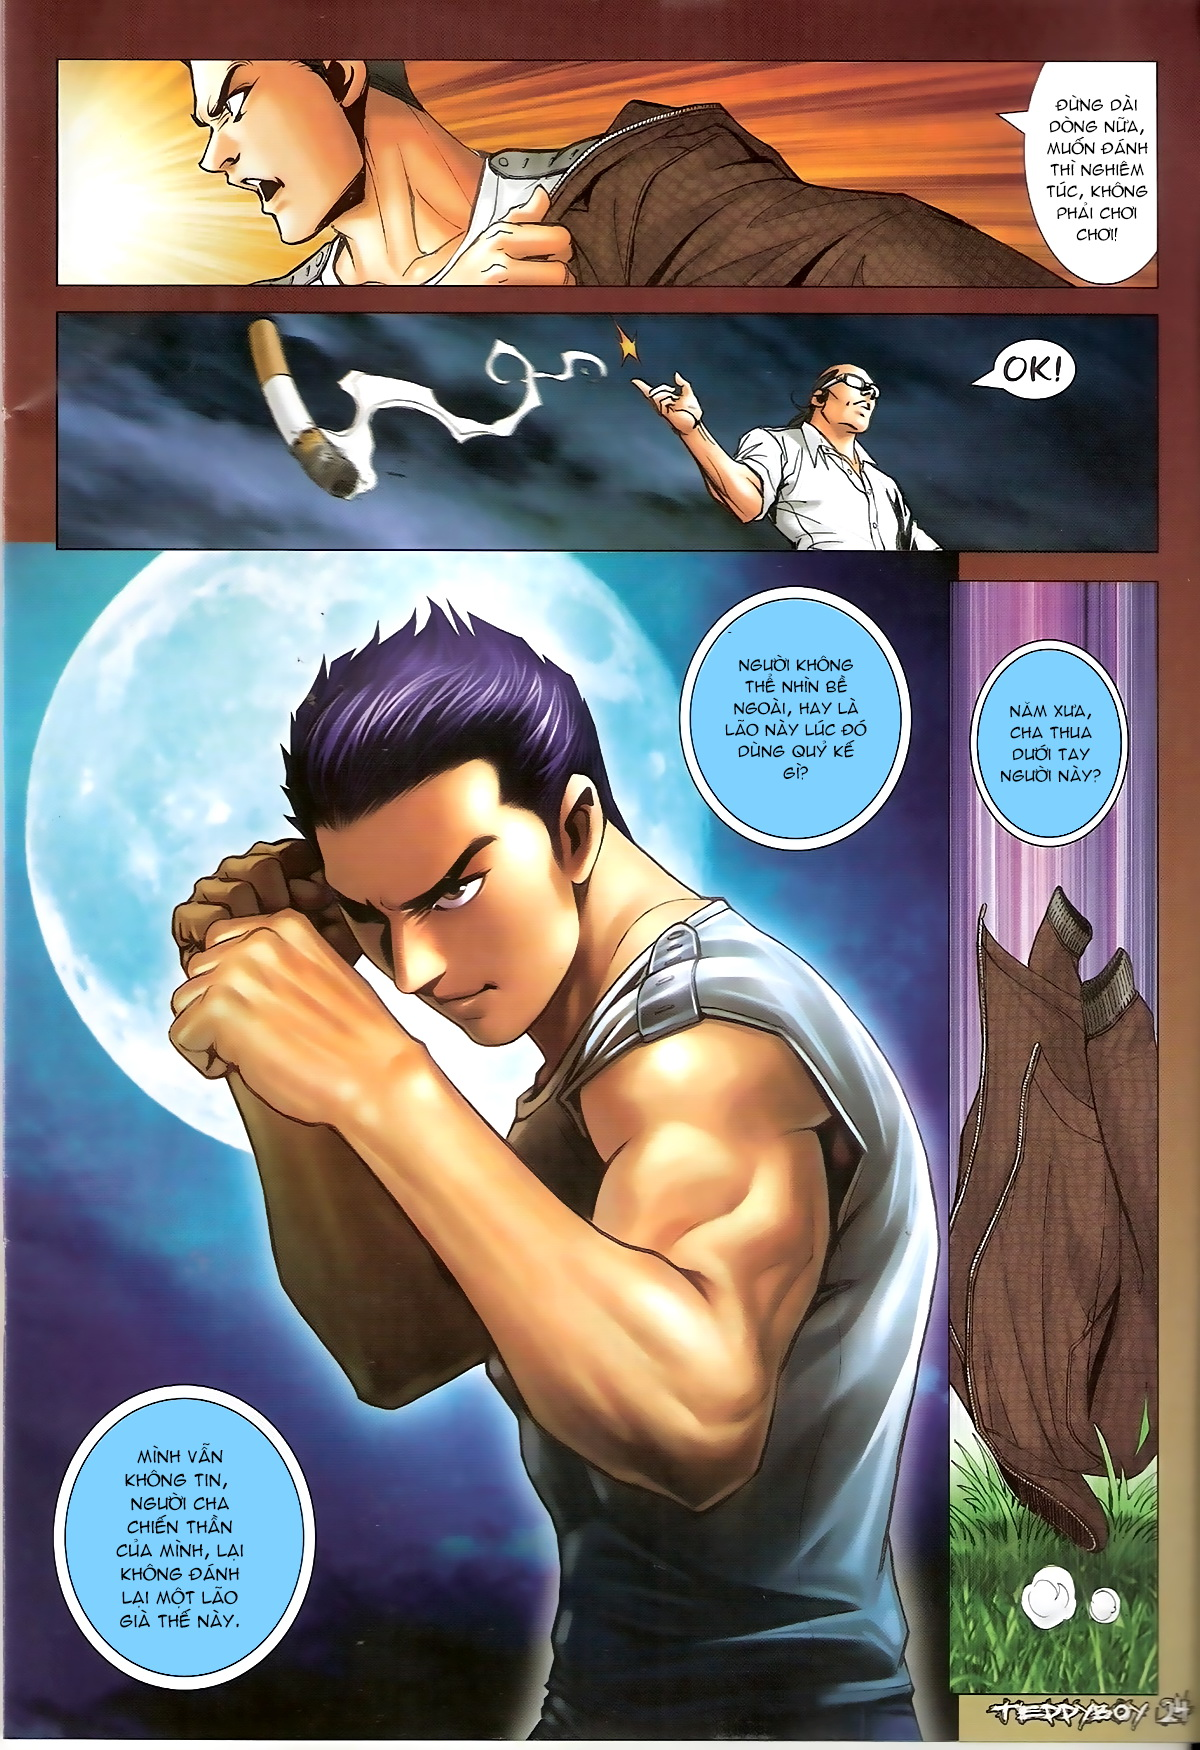 Người Trong Giang Hồ - Chapter 1317: Tao phải thắng lão - Pic 20